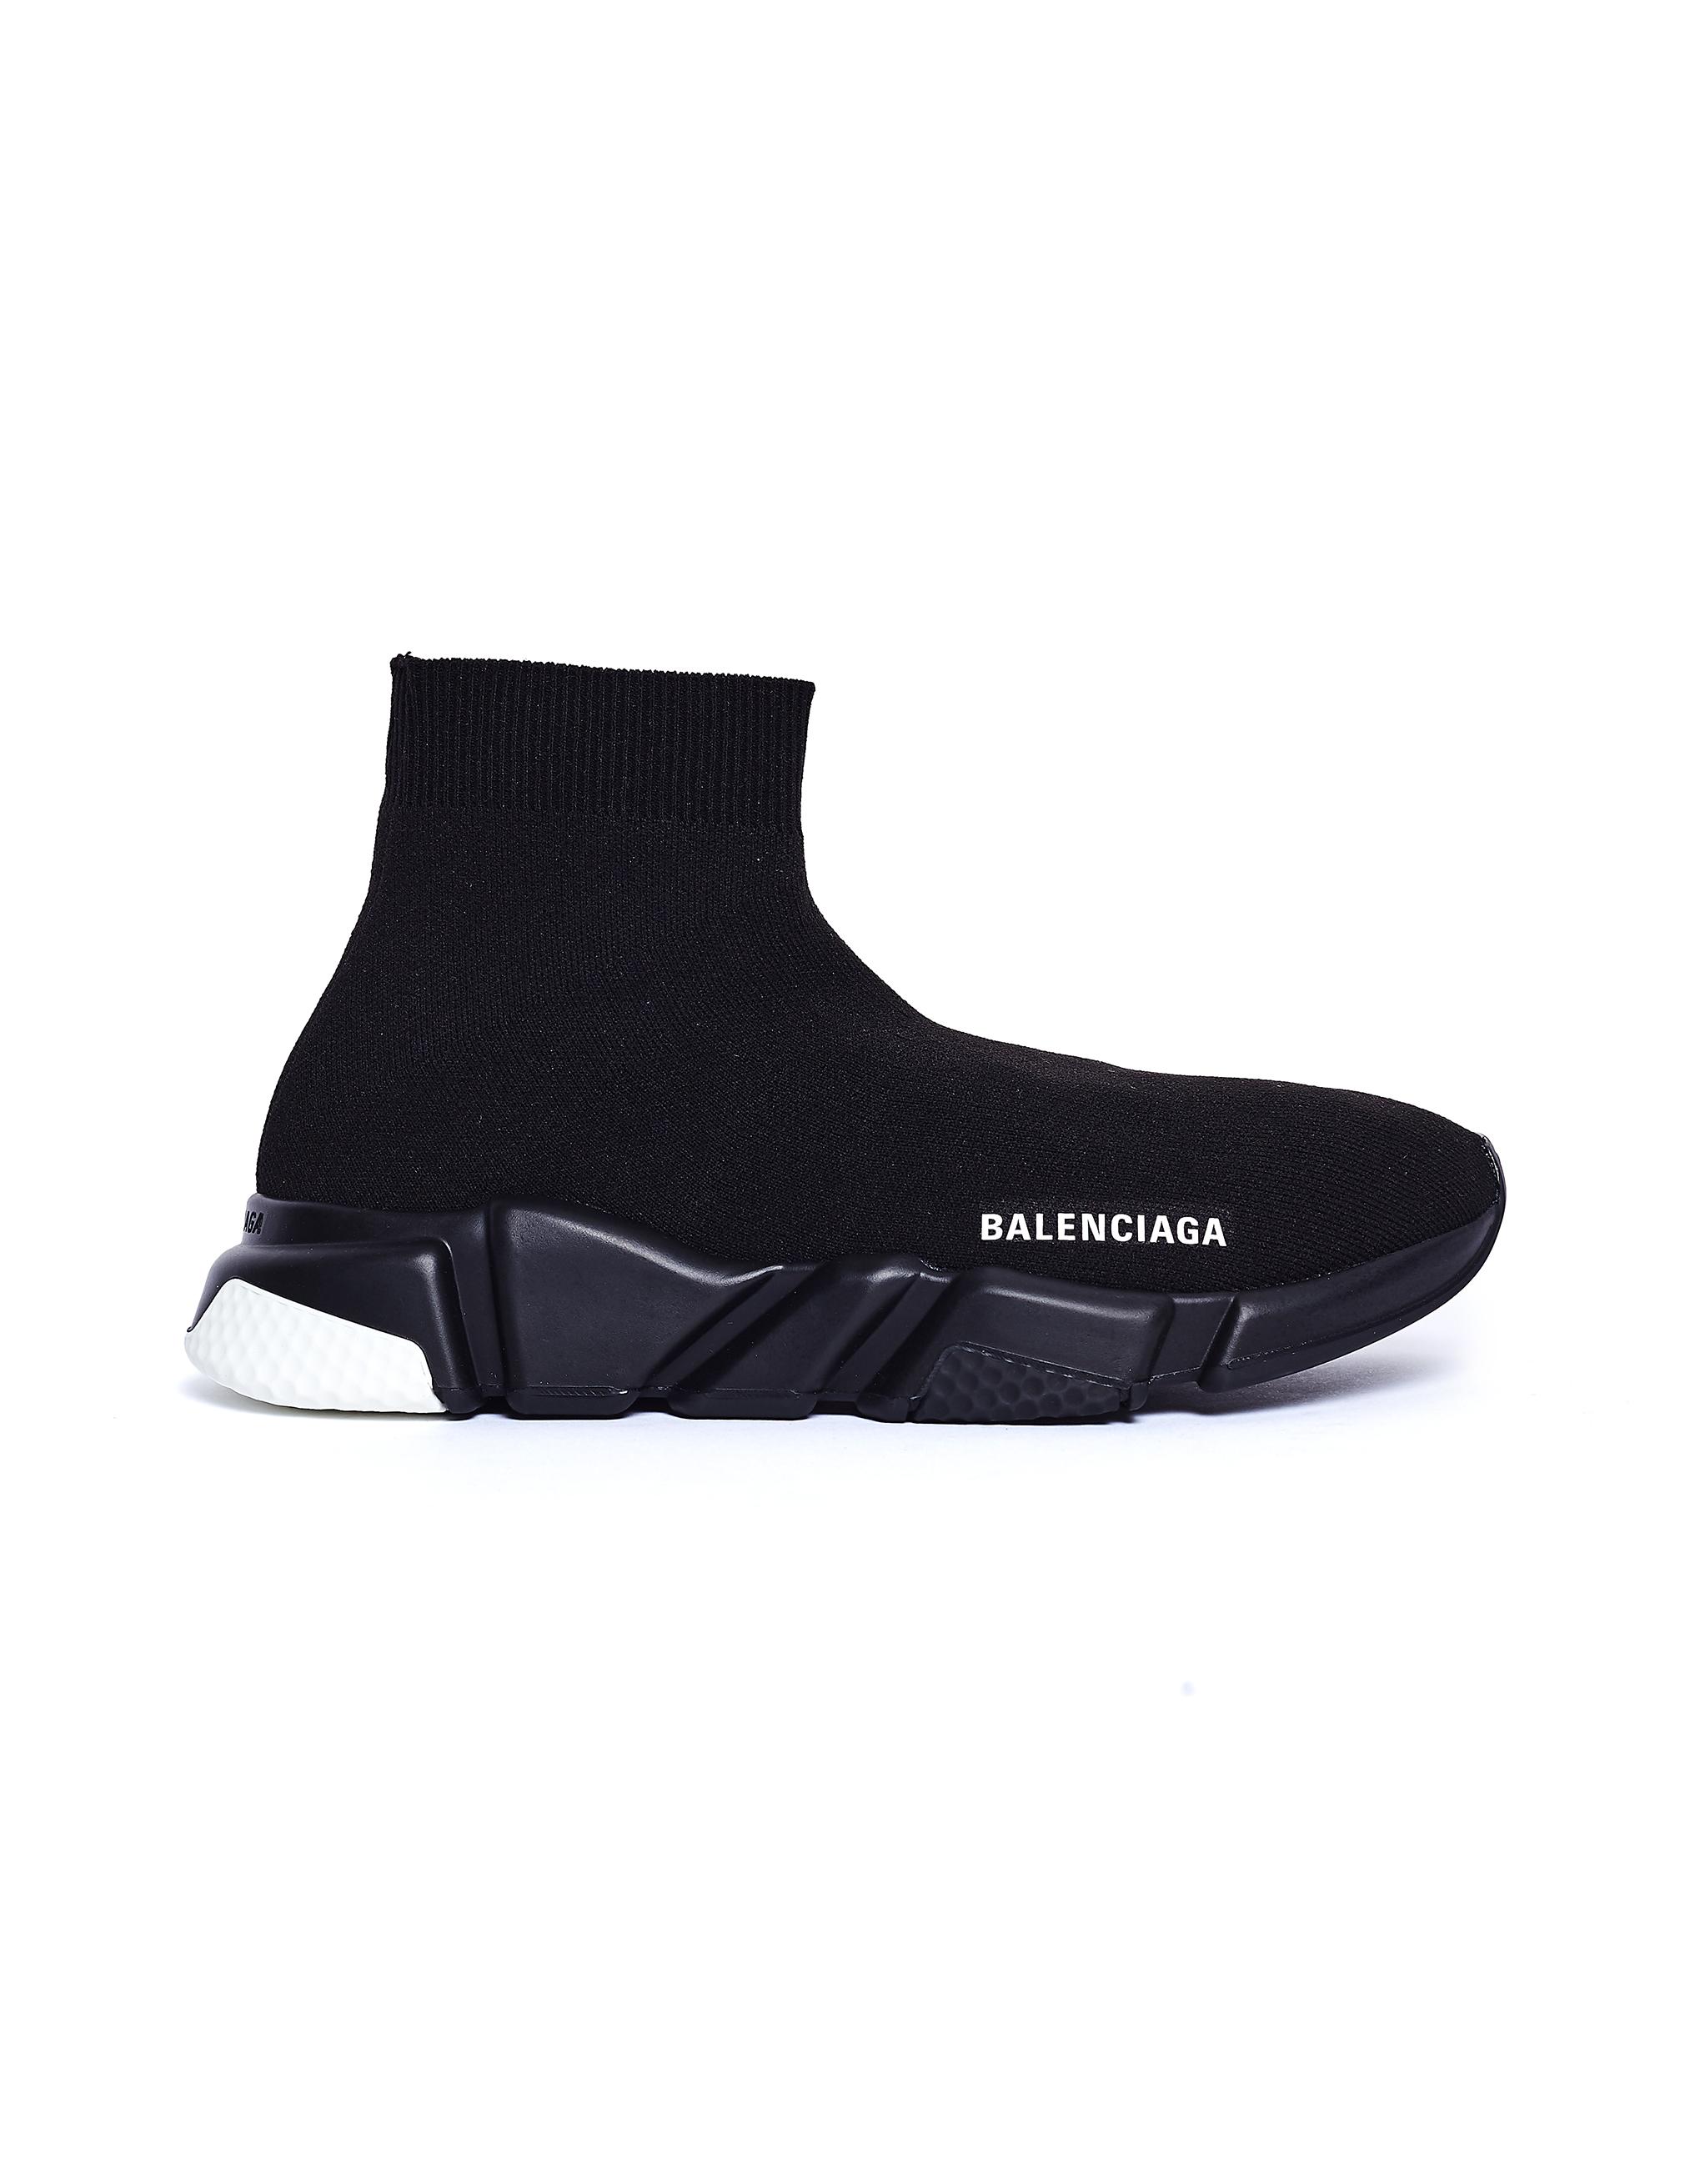 Balenciaga Black Speed Trainer Sneakers